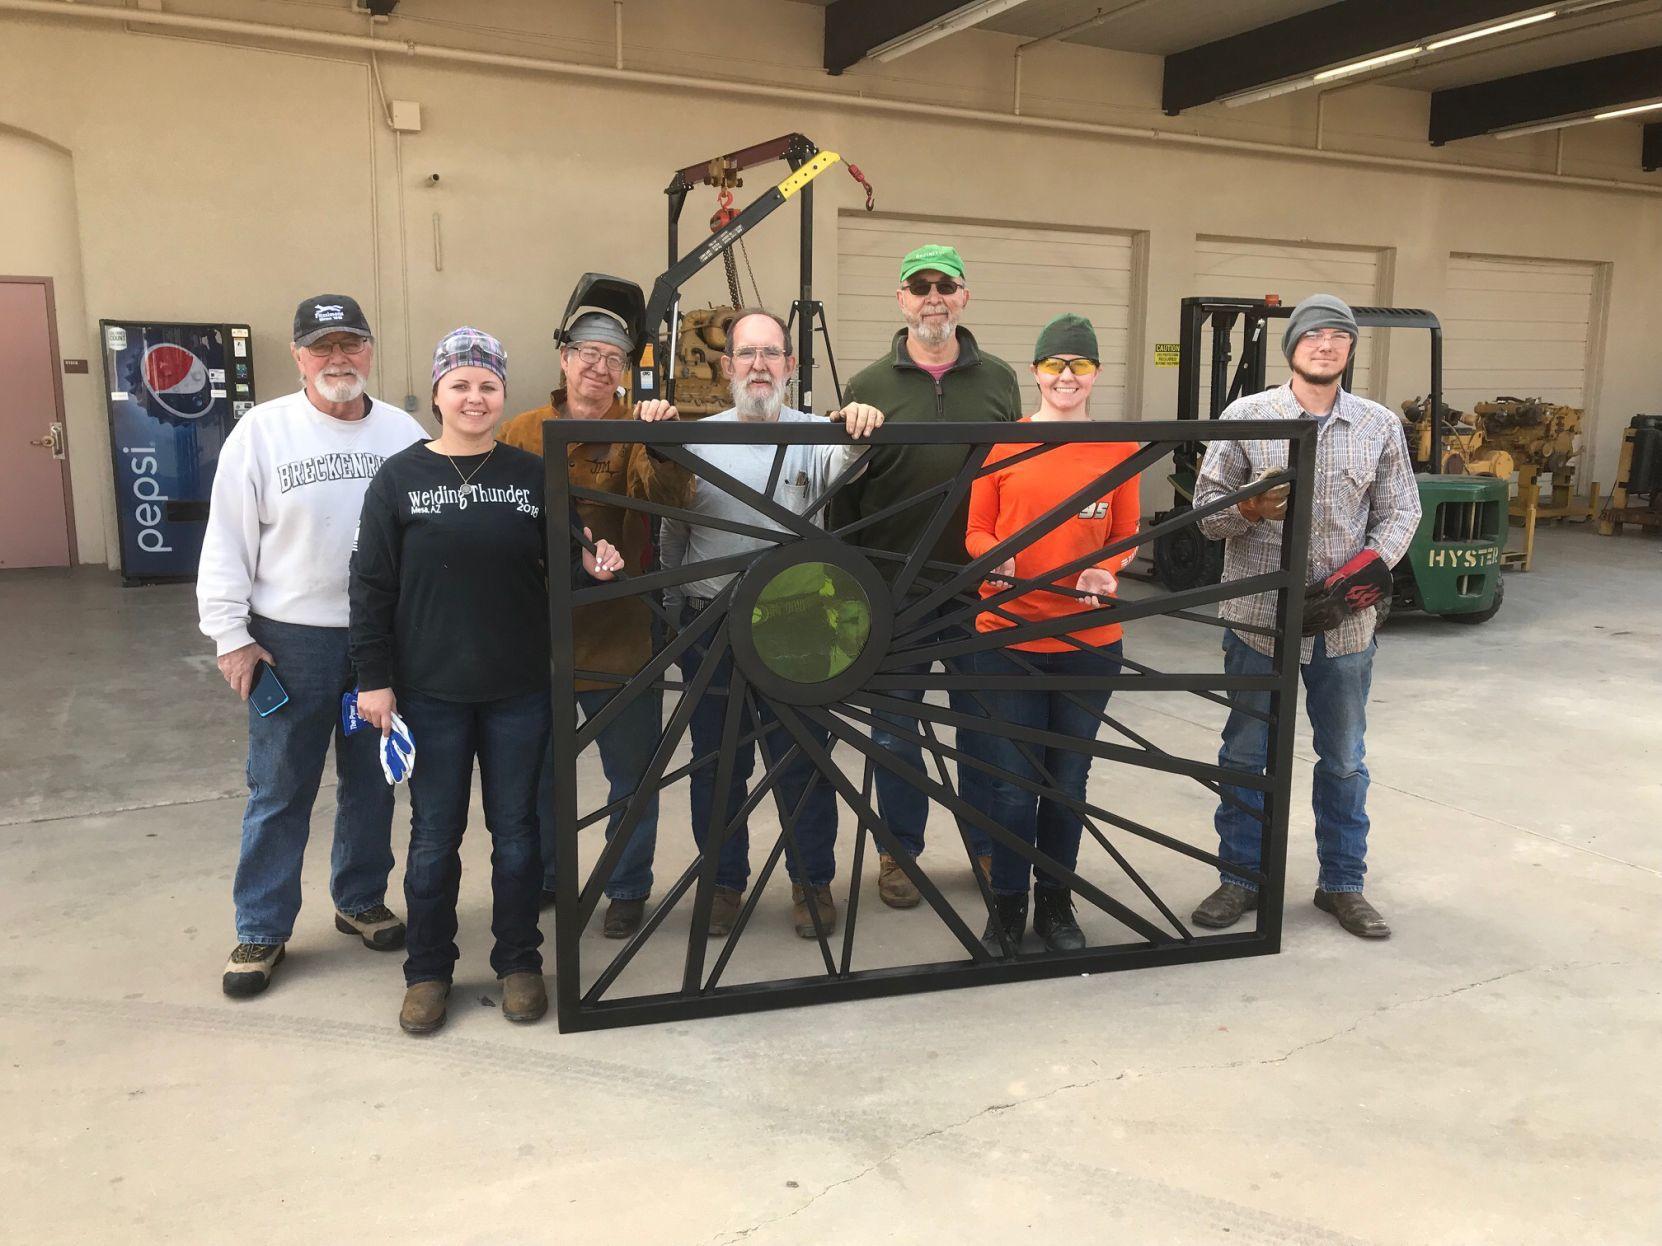 Custom-made steel panel from CG art museum fence stolen